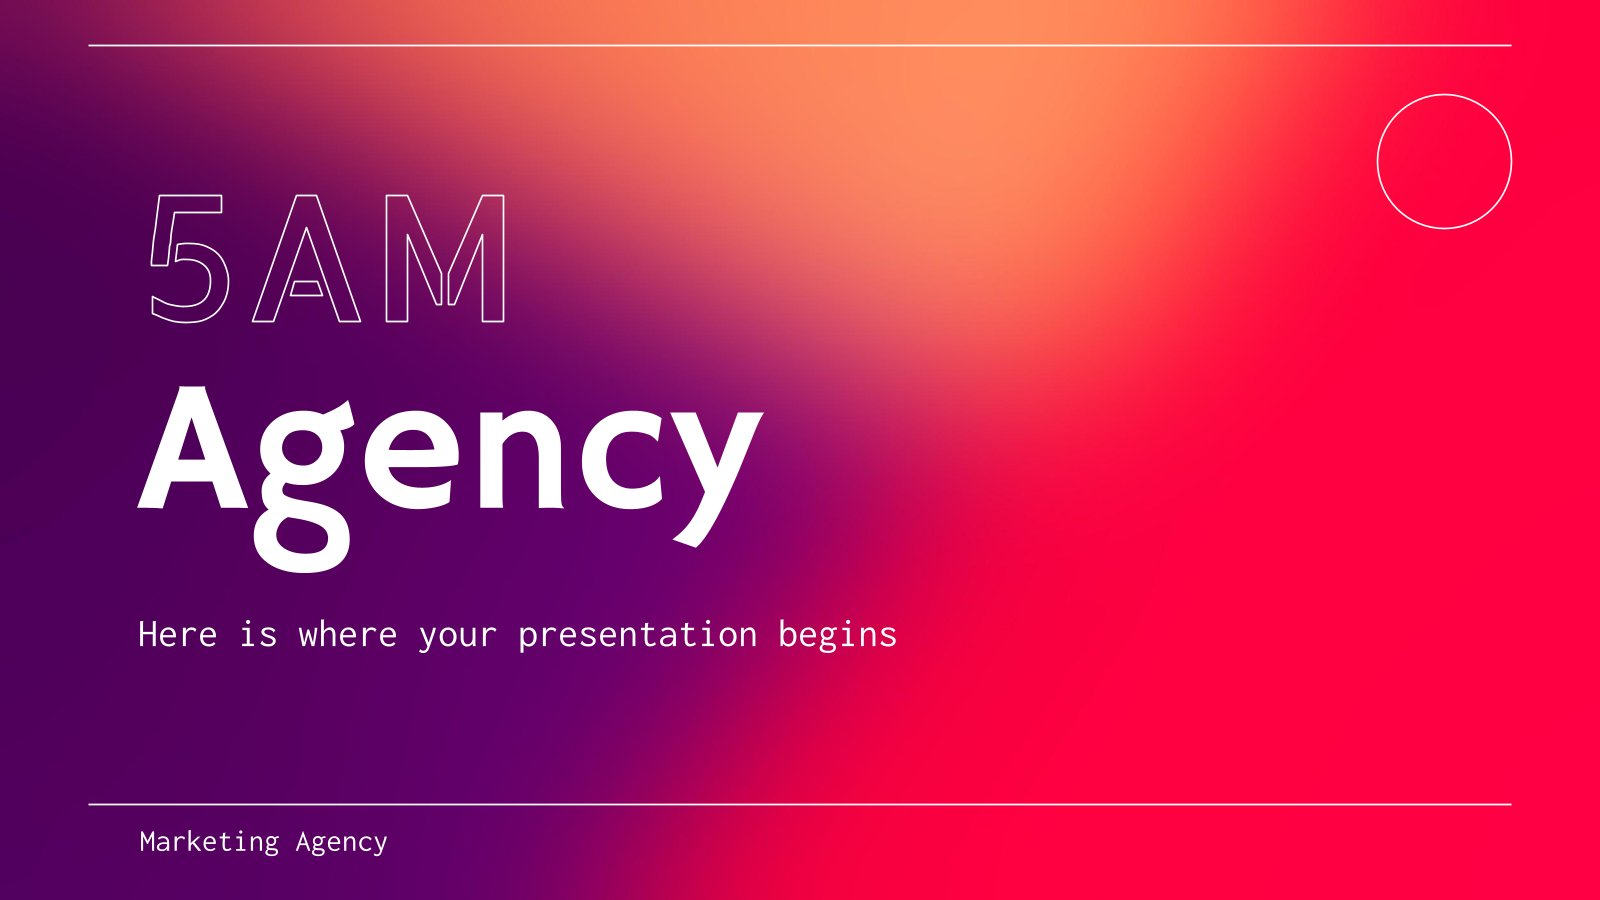 5AM Agency presentation template